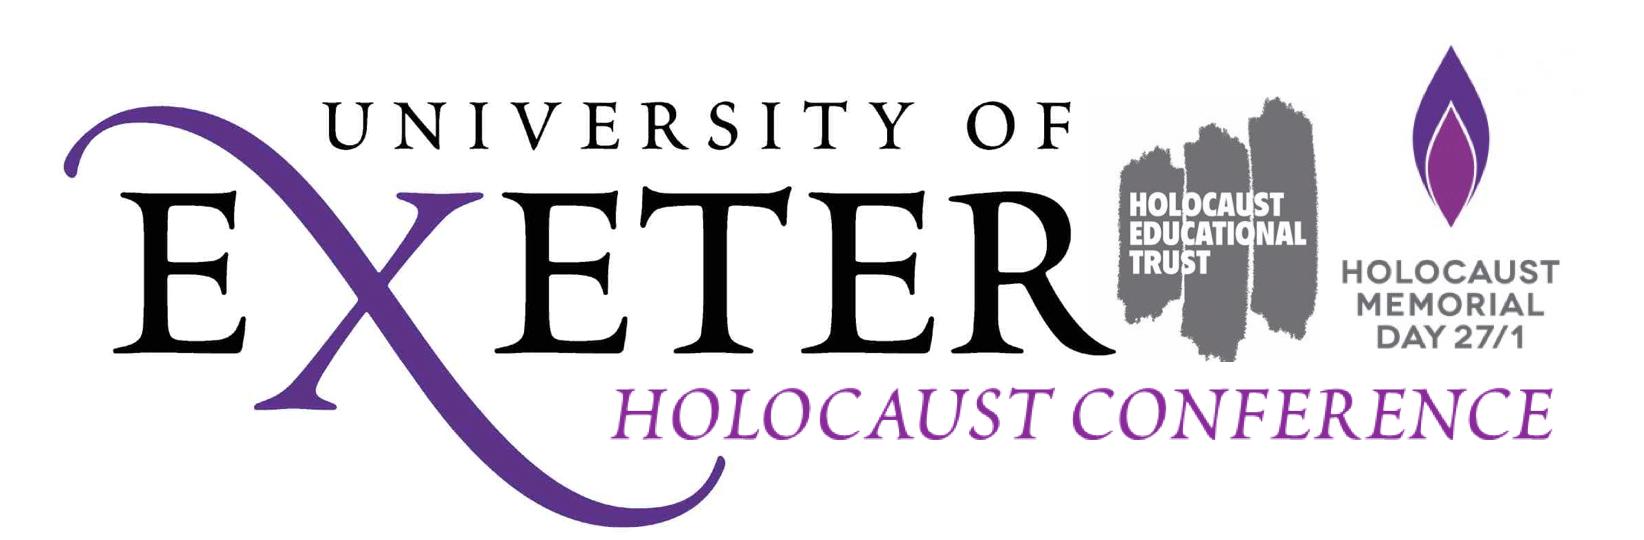 Holocaust Memorial Conference